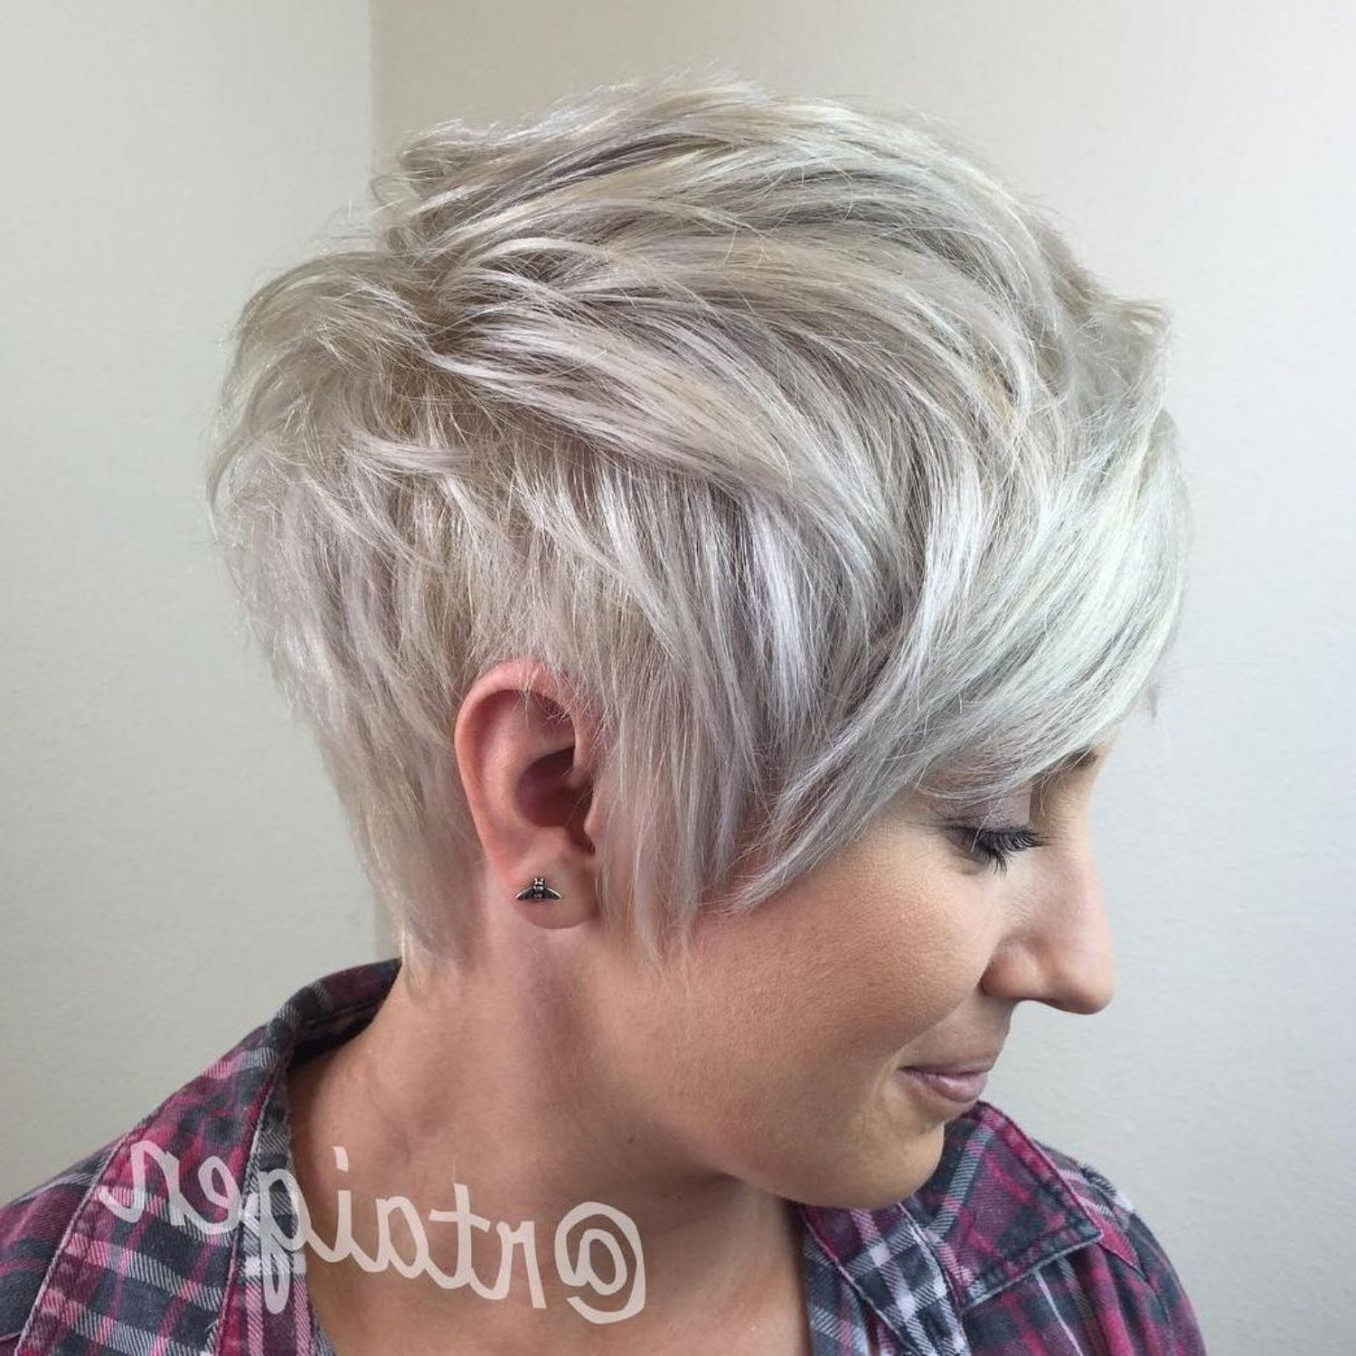 Long Ash Blonde Pixie | Cuts | Pinterest | Short Choppy Haircuts In Long Messy Ash Blonde Pixie Haircuts (Gallery 1 of 20)